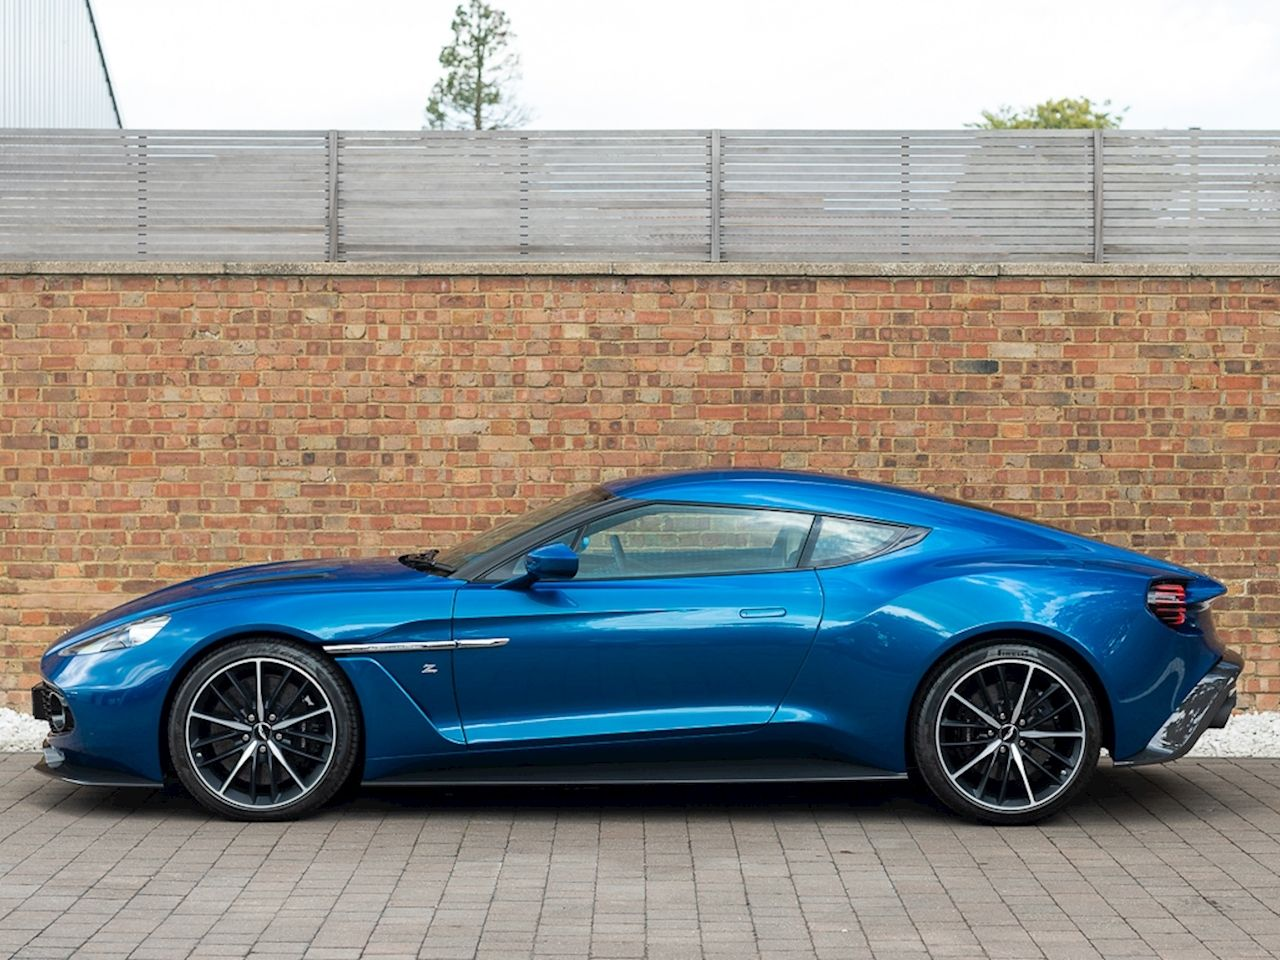 Aston Martin Vanquish Zagato Coupe Luxury Pulse Cars United Kingdom For Sale On Luxurypulse Aston Martin Vanquish Aston Martin Vanquish